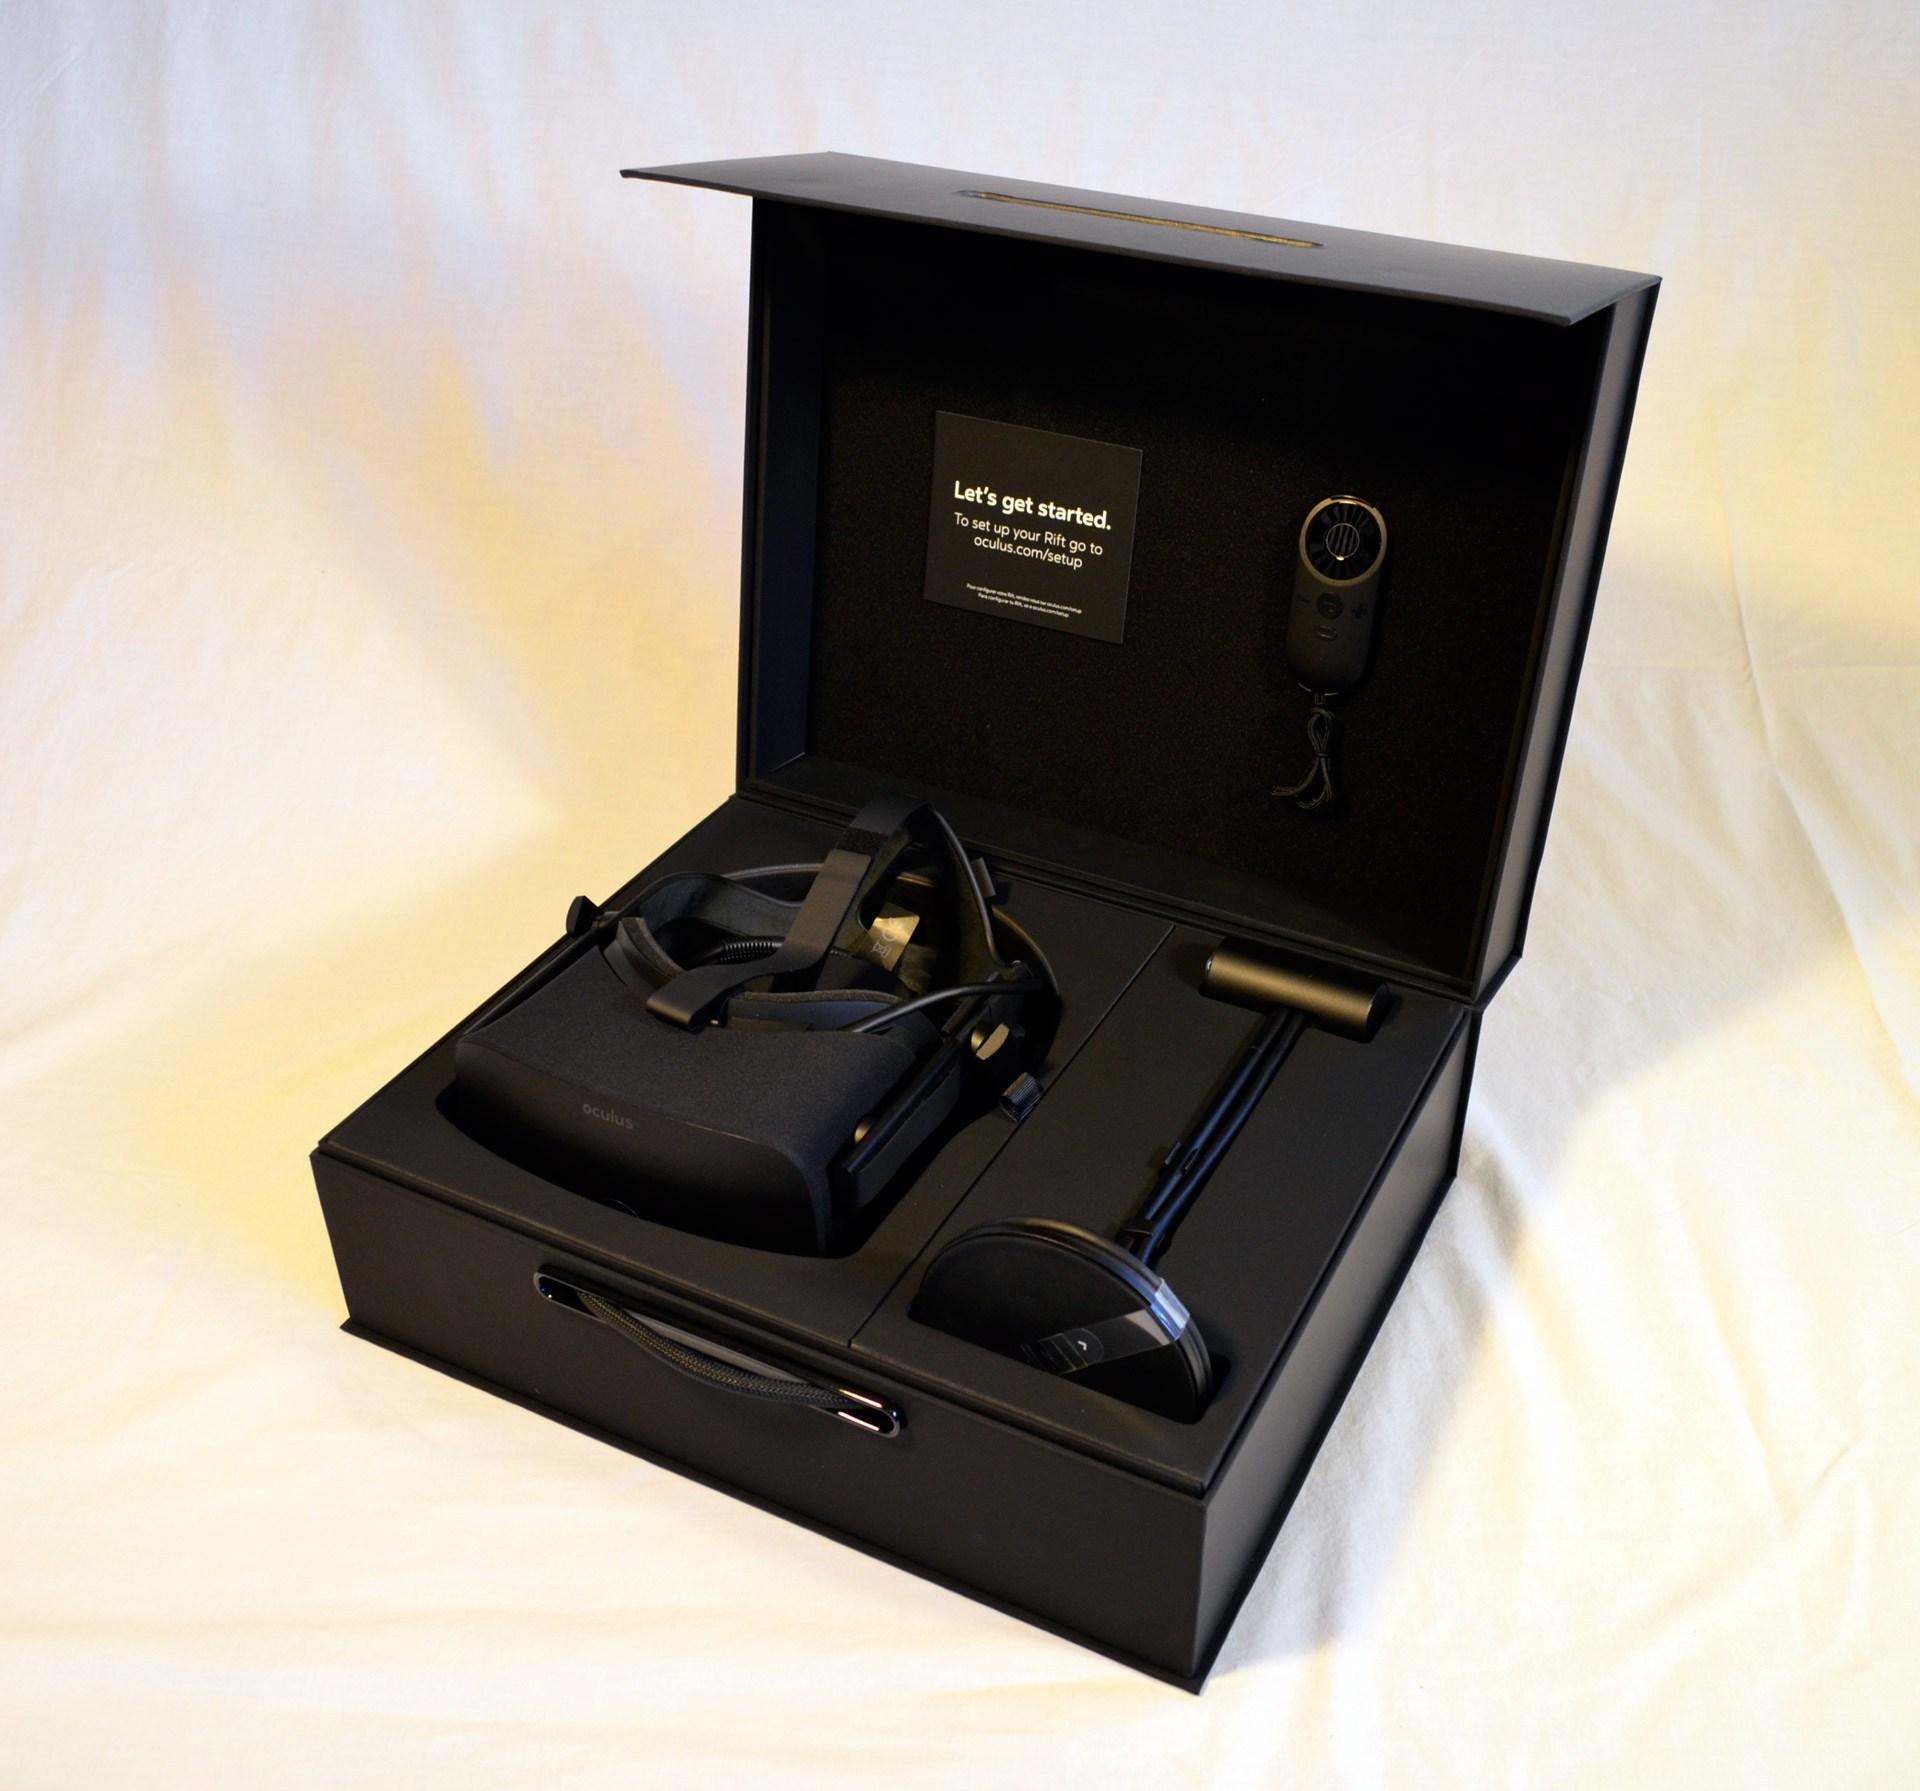 oculus-rift-cv1-unboxing-23.jpg